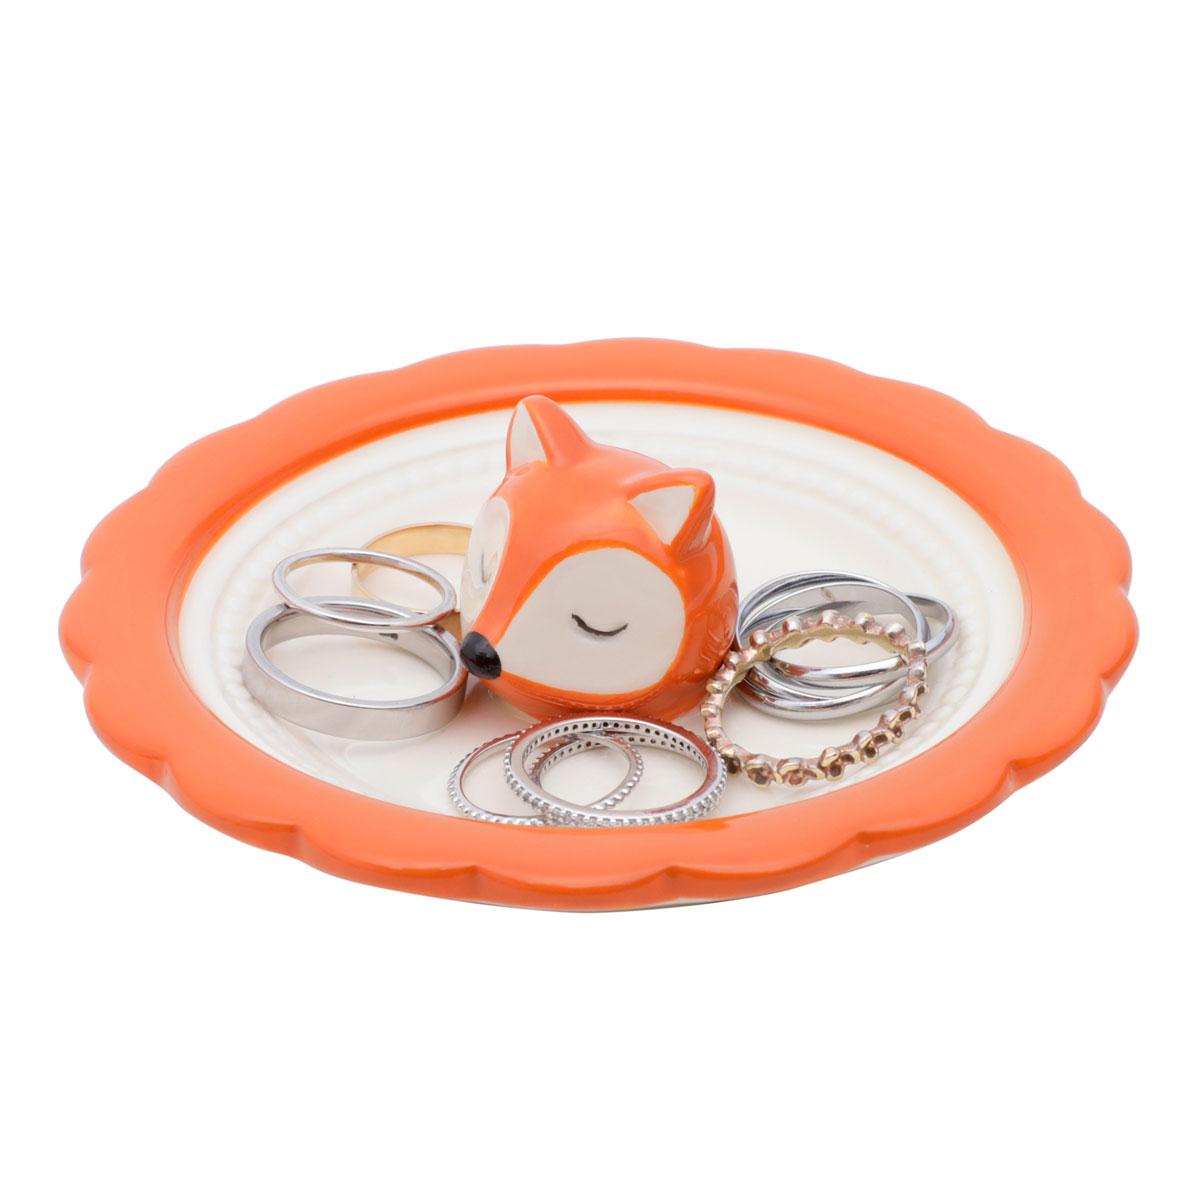 Mini Prato Decorativo Porta Anéis e Acessórios Raposa Face Laranja - Presente Super